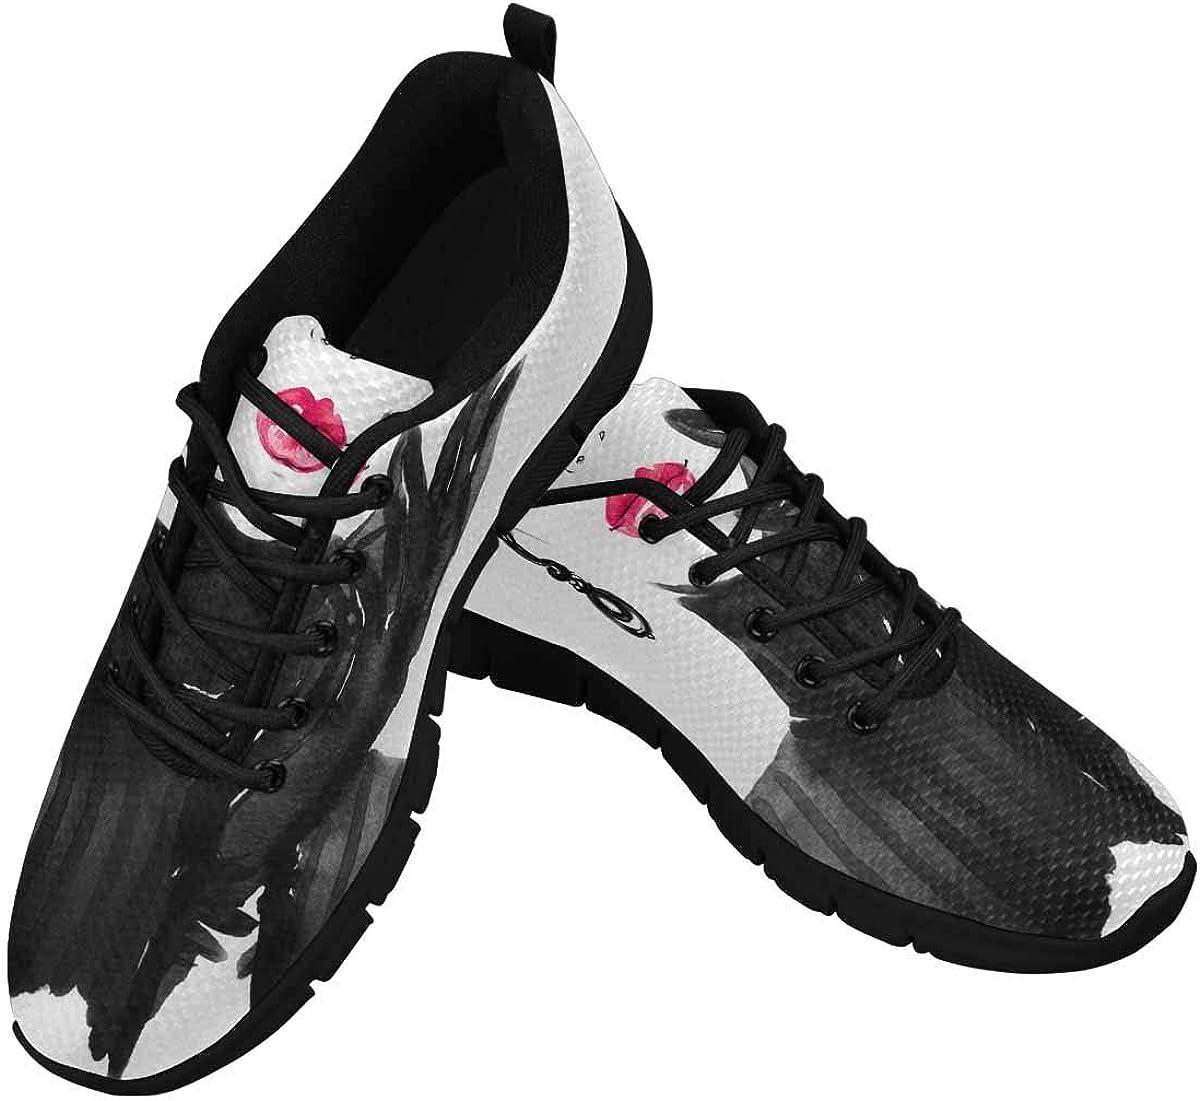 INTERESTPRINT Beautiful Woman Portrait Women's Athletic Walking Shoes Casual Mesh Comfortable Work Sneakers